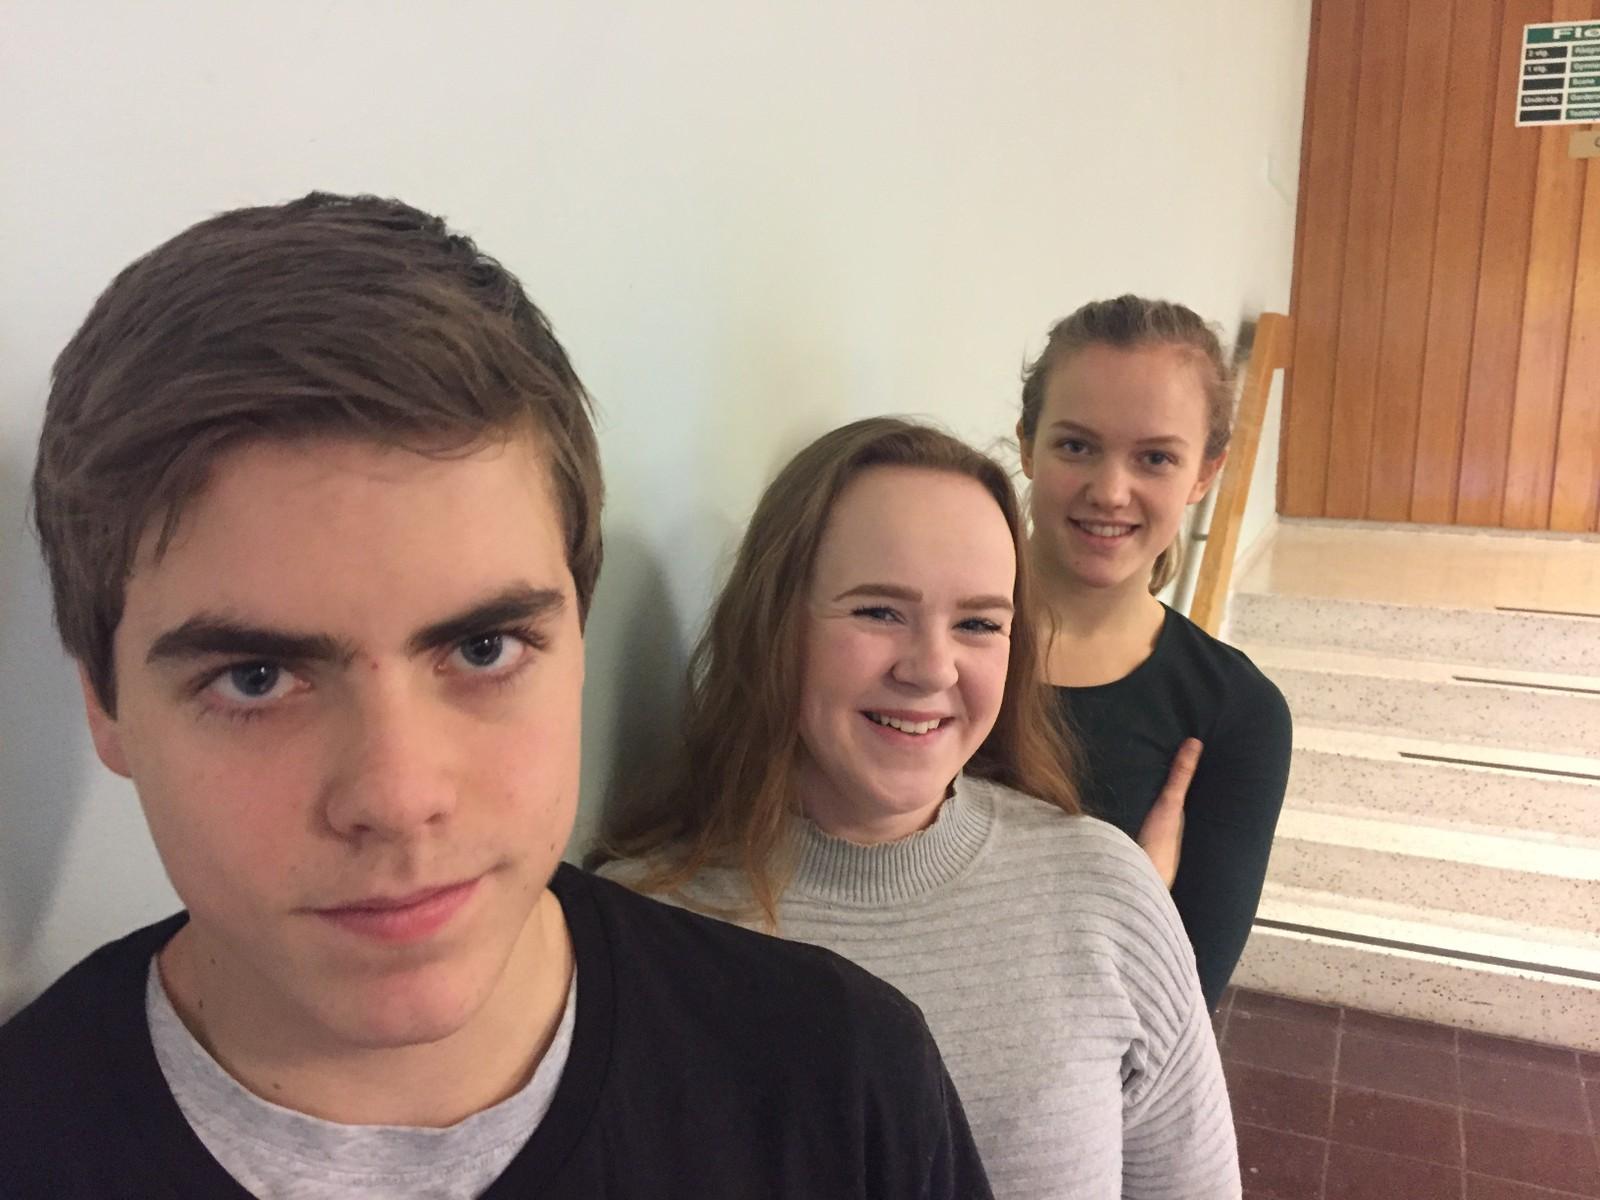 HØKNES UNGDOMSSKOLE: Stian Aglen, Vilde Løvmo og Karen Theresie Bech